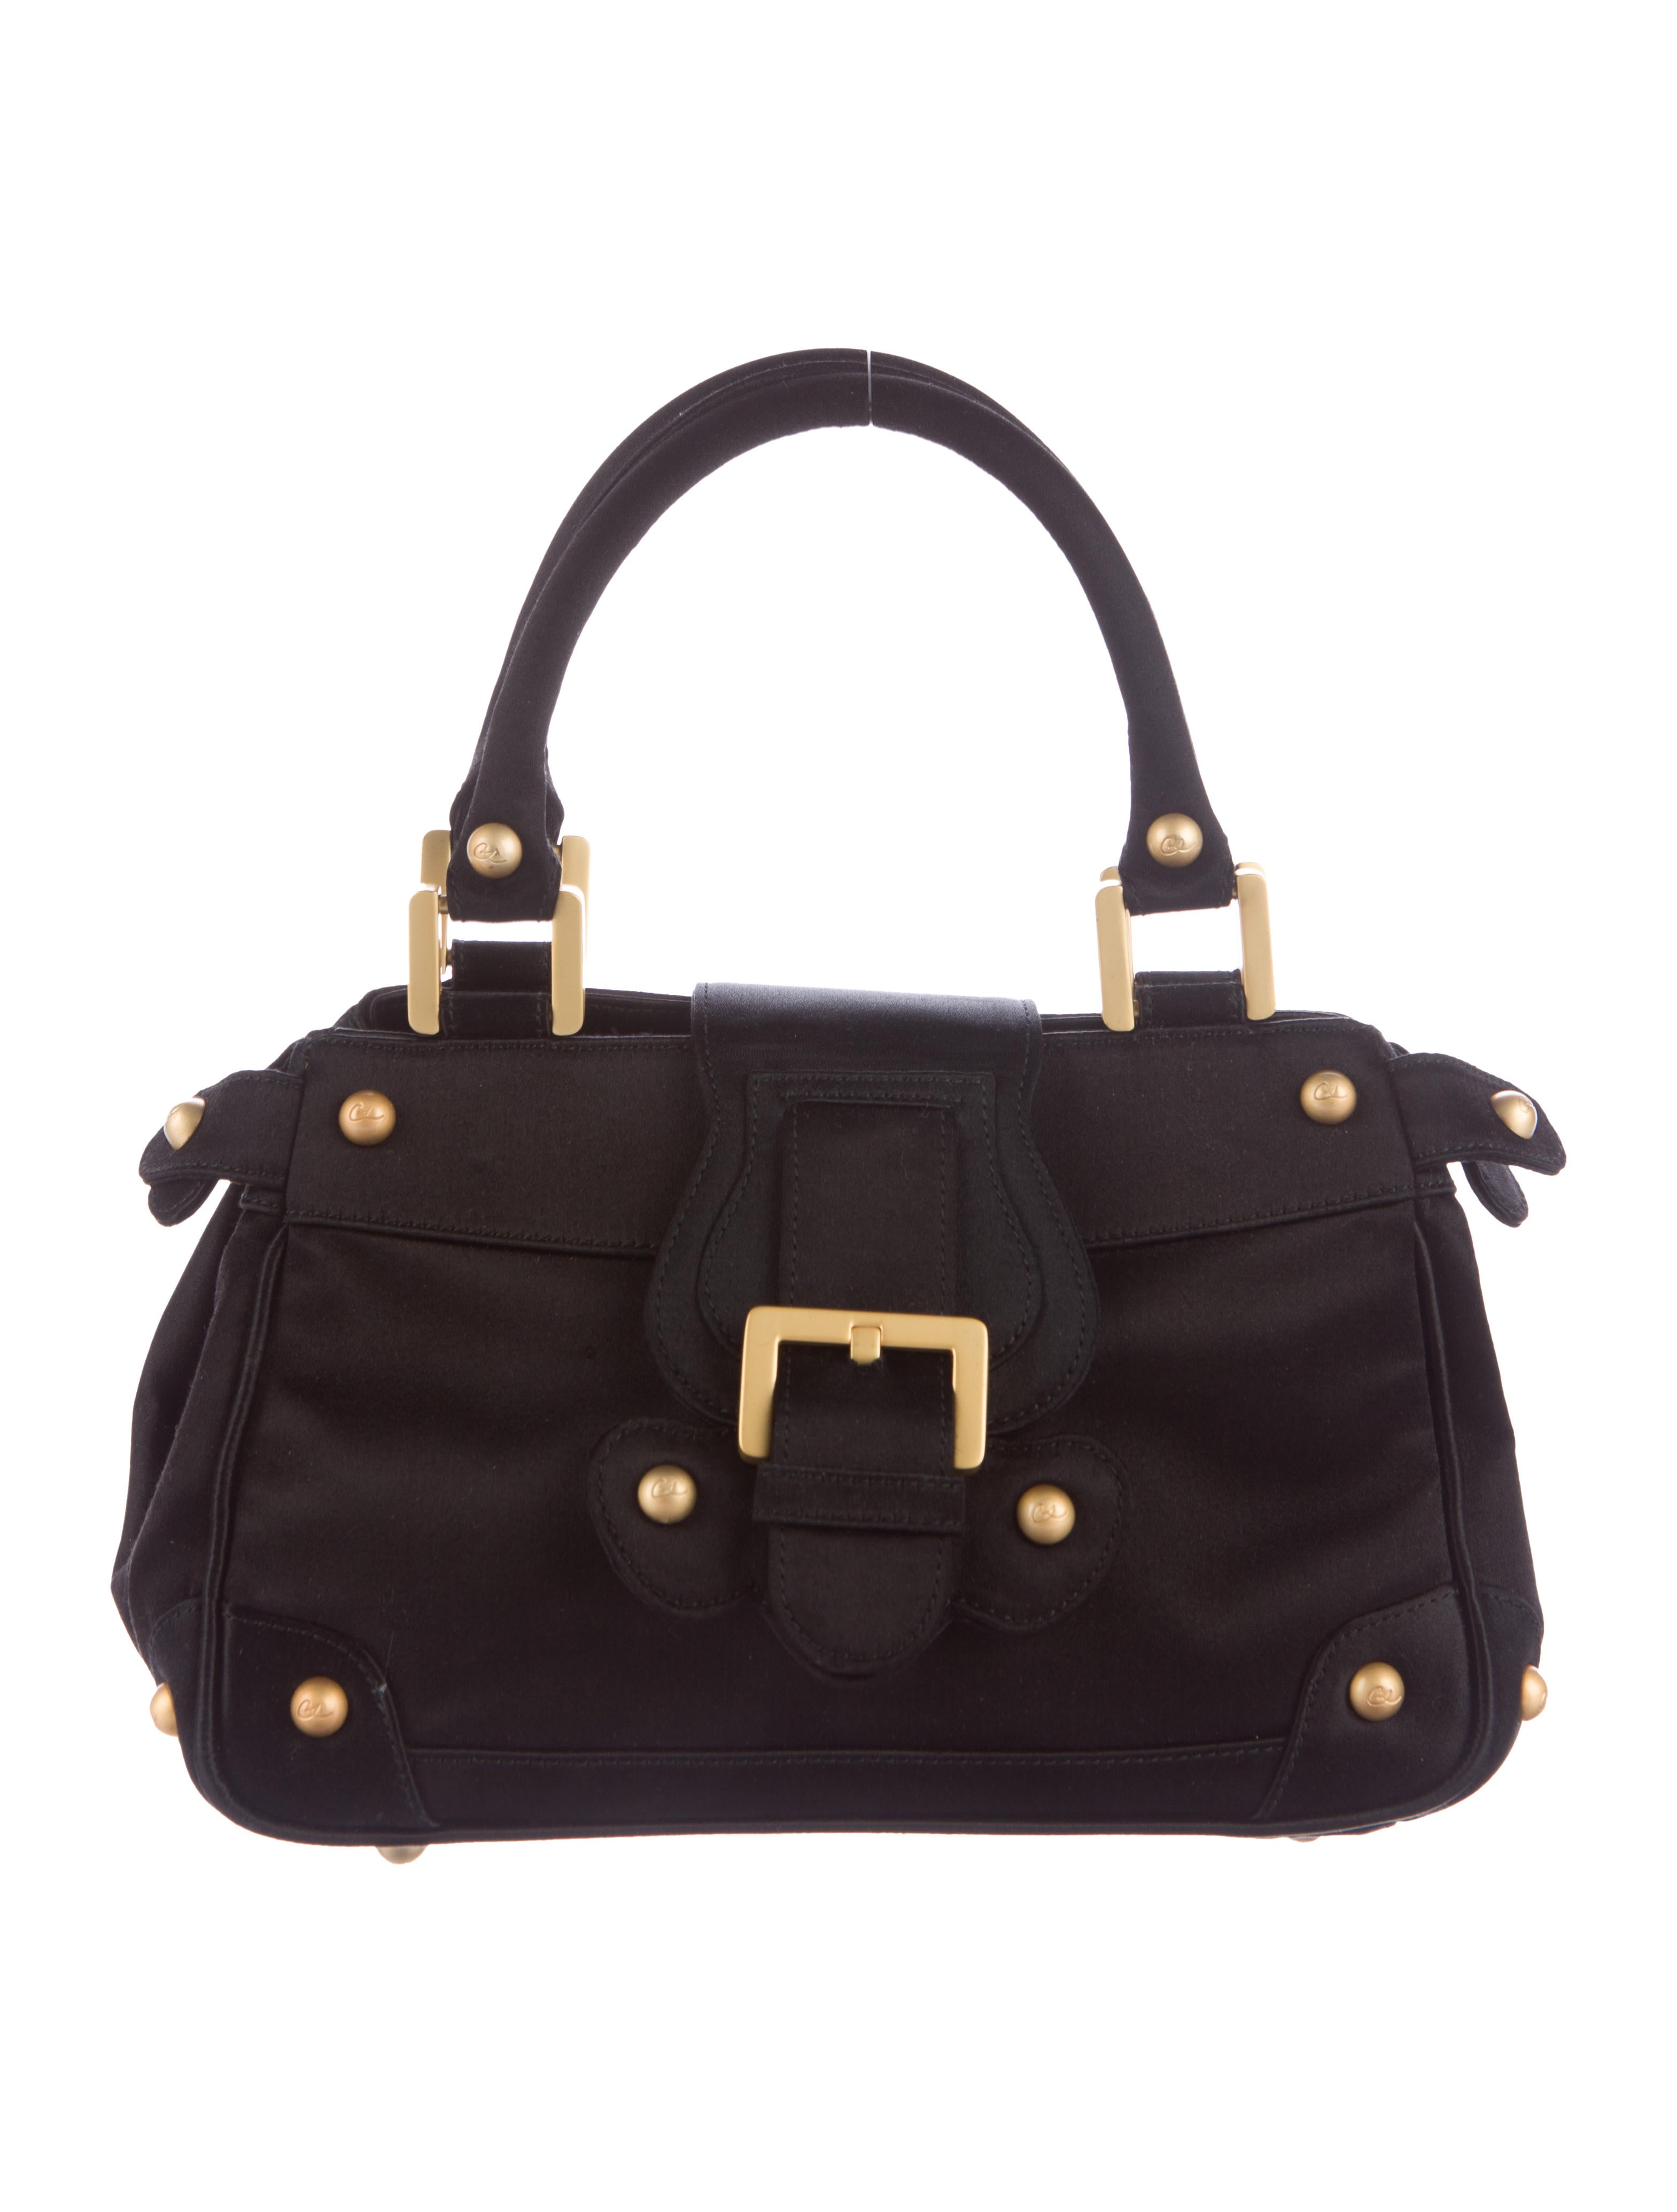 Christian Lacroix Satin Handle Bag Handbags Chs22347